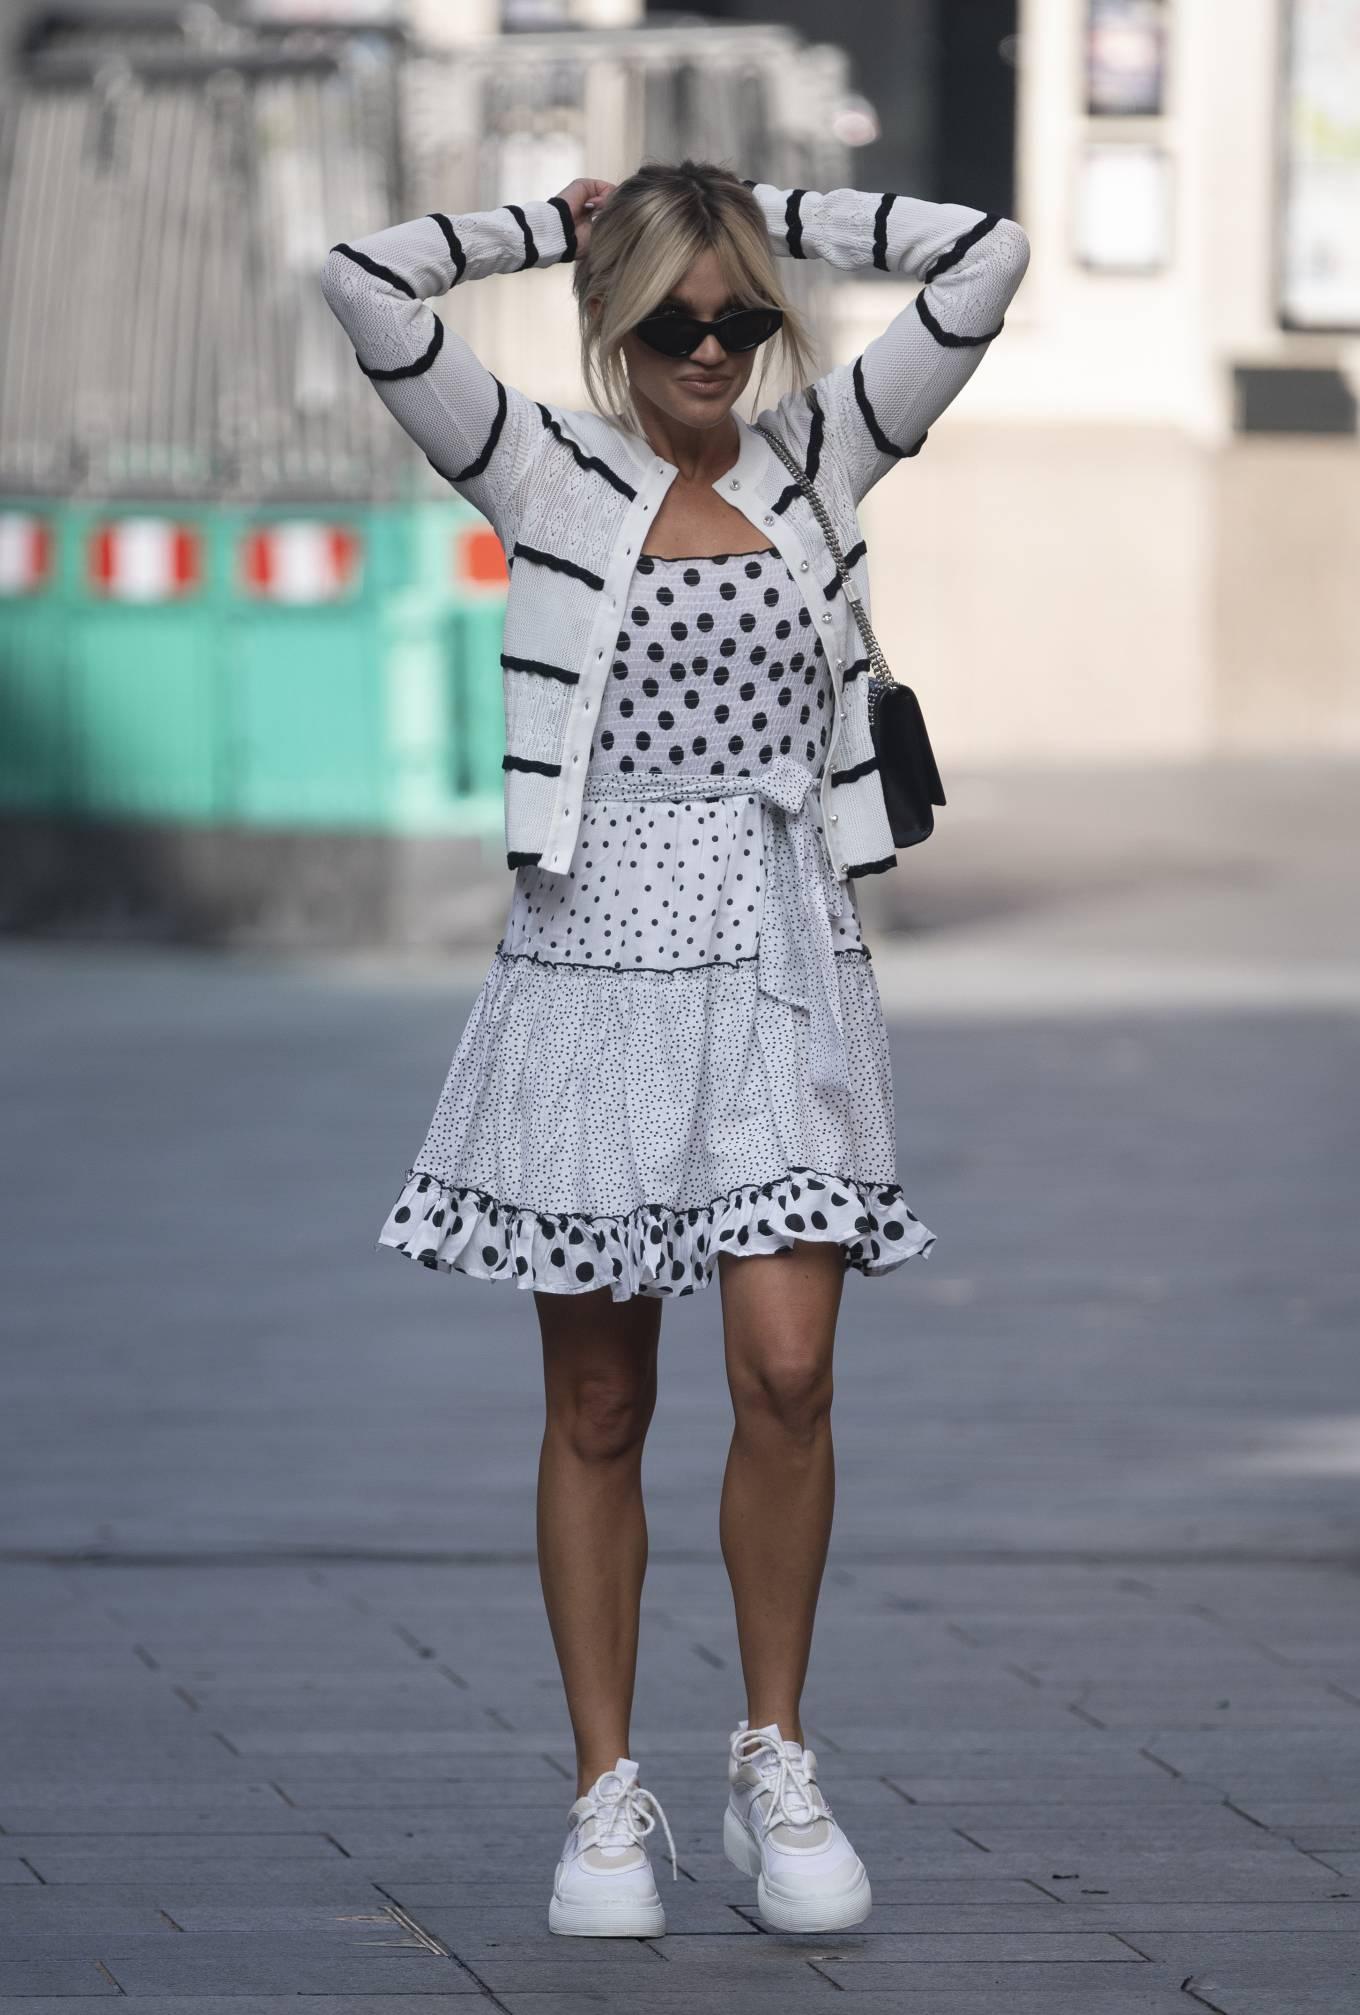 Ashley Roberts - Wears White Polka Dot dress in London